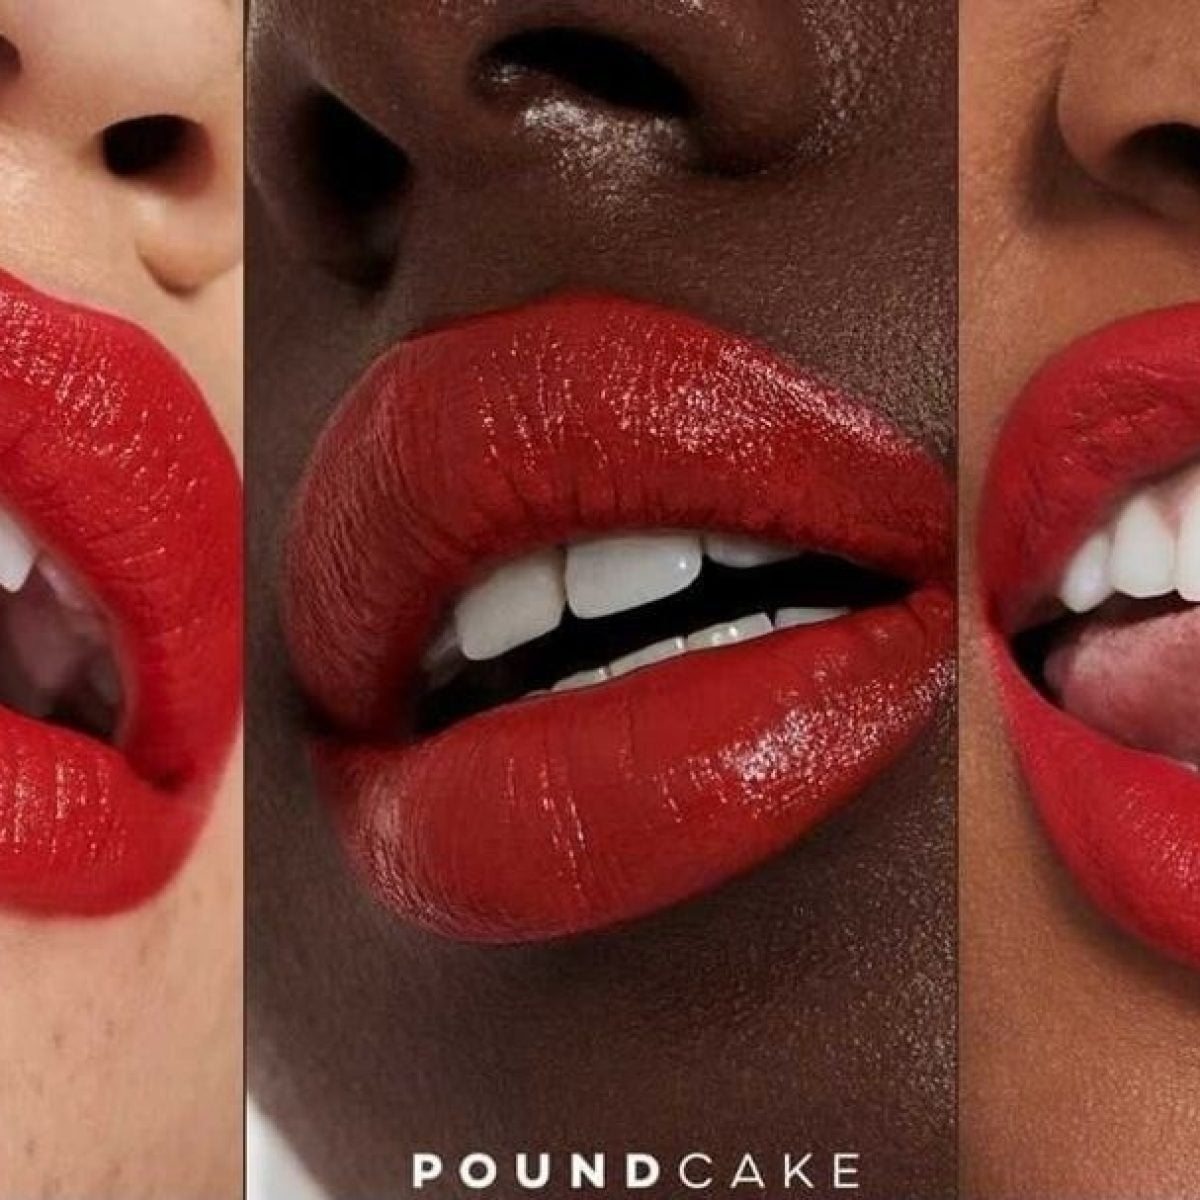 Pucker Up! Pound Cake Cosmetics Designs Innovative Red Lipsticks For Black Women